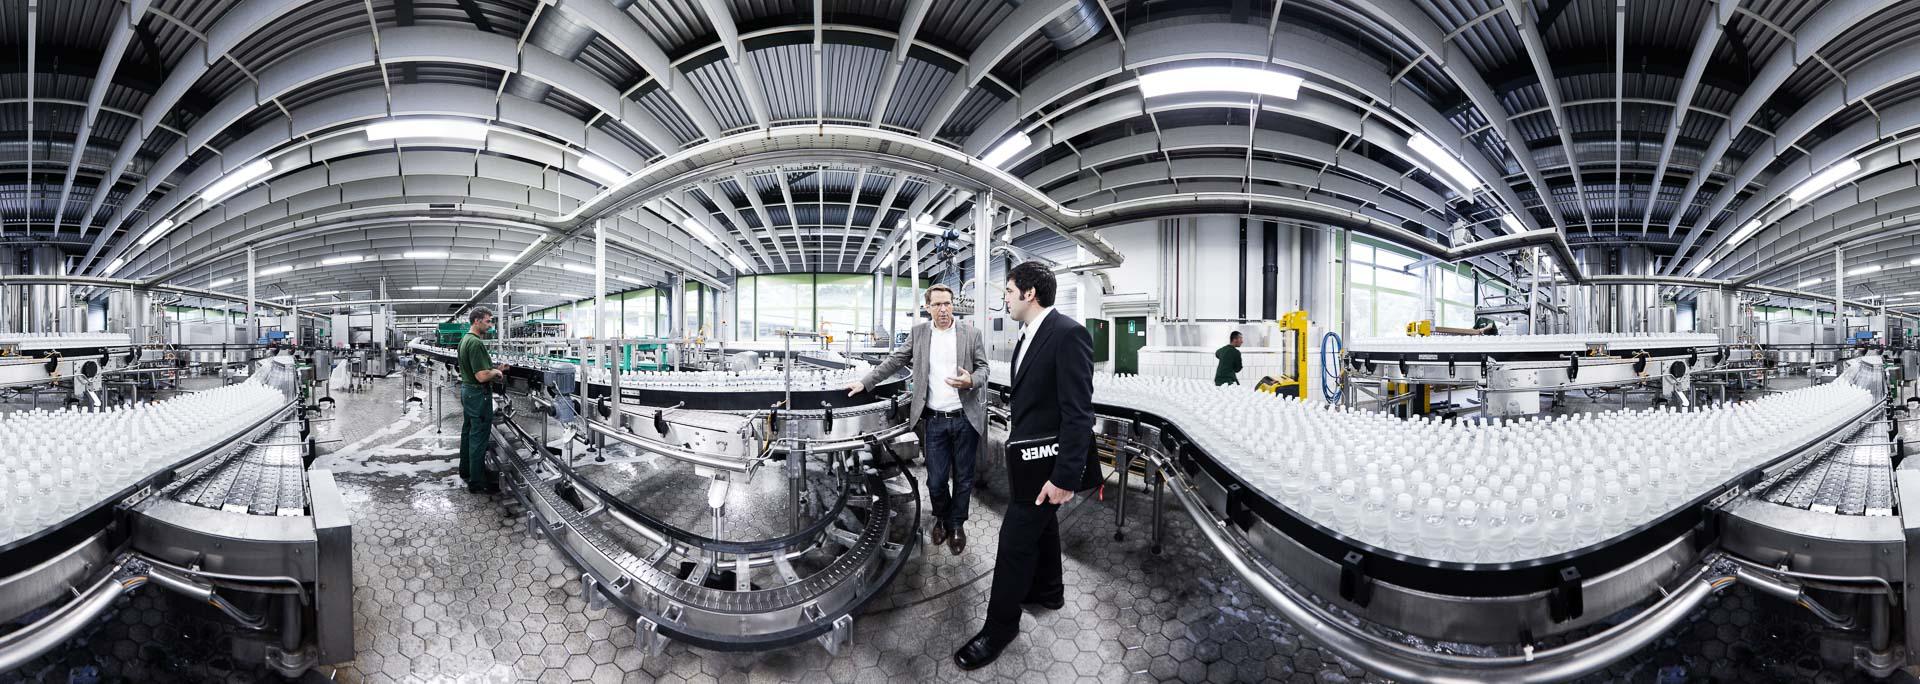 Mineralwasser Fabrik Abfüllung Schweiz – 360° Foto